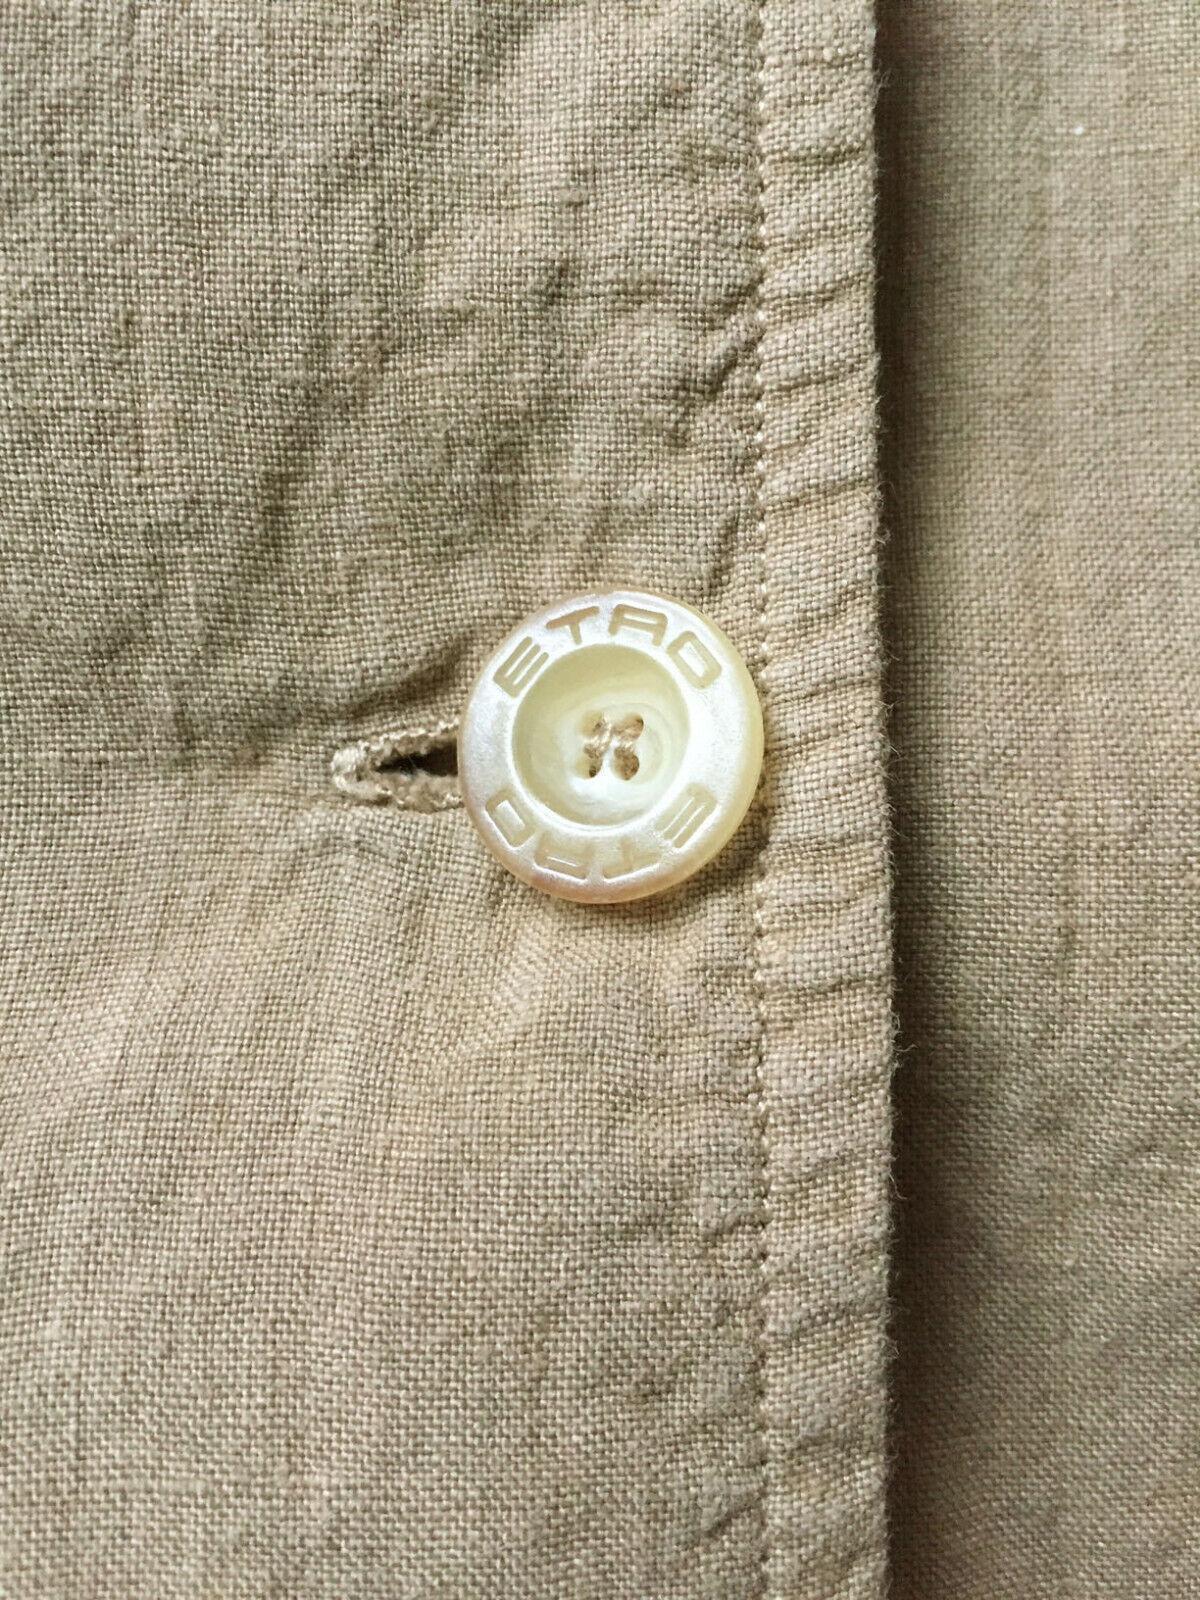 ETRO Womens Sz 44 / US 8 Tan Linen Jacket French … - image 3